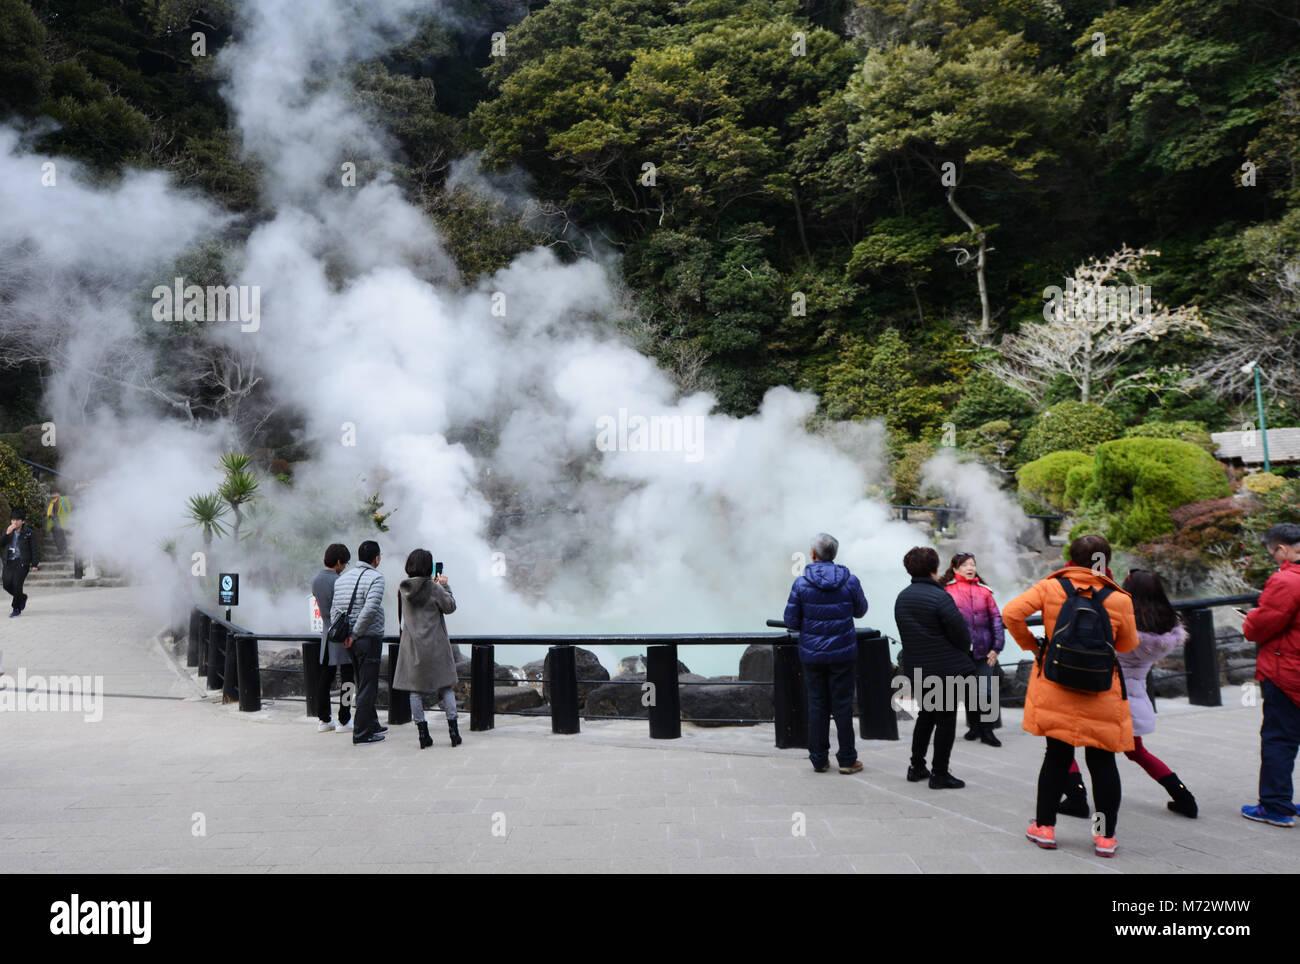 Tourist looking at the Umi Jigoku ( Ocean Hell ) hot spring in Beppu, Japan. - Stock Image